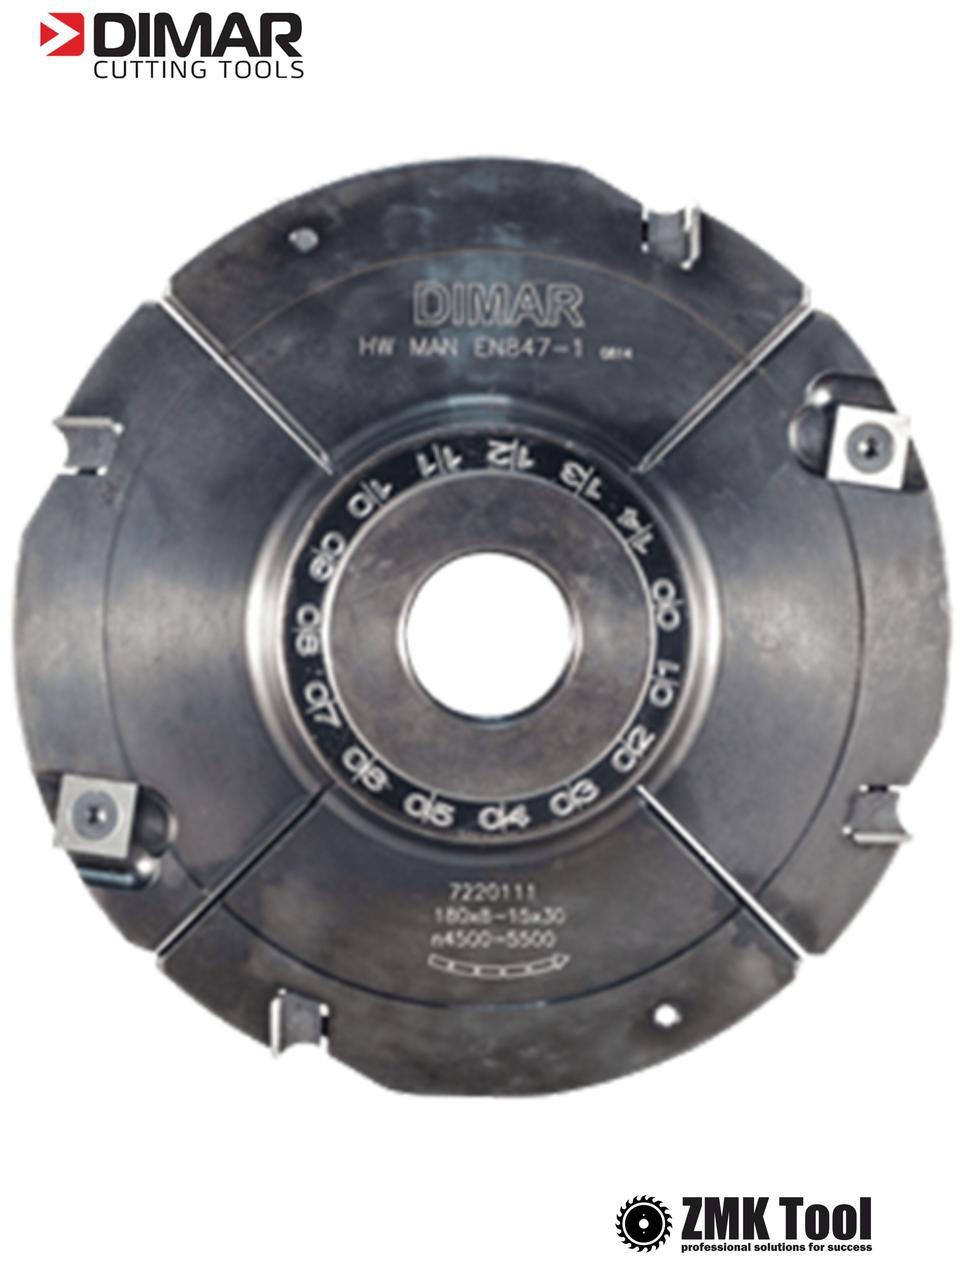 Фреза насадная DIMAR для пазування с возможностью регулировки 4.0-7.5 мм D=160 d=30 B=4.0-7.5 Z8+4